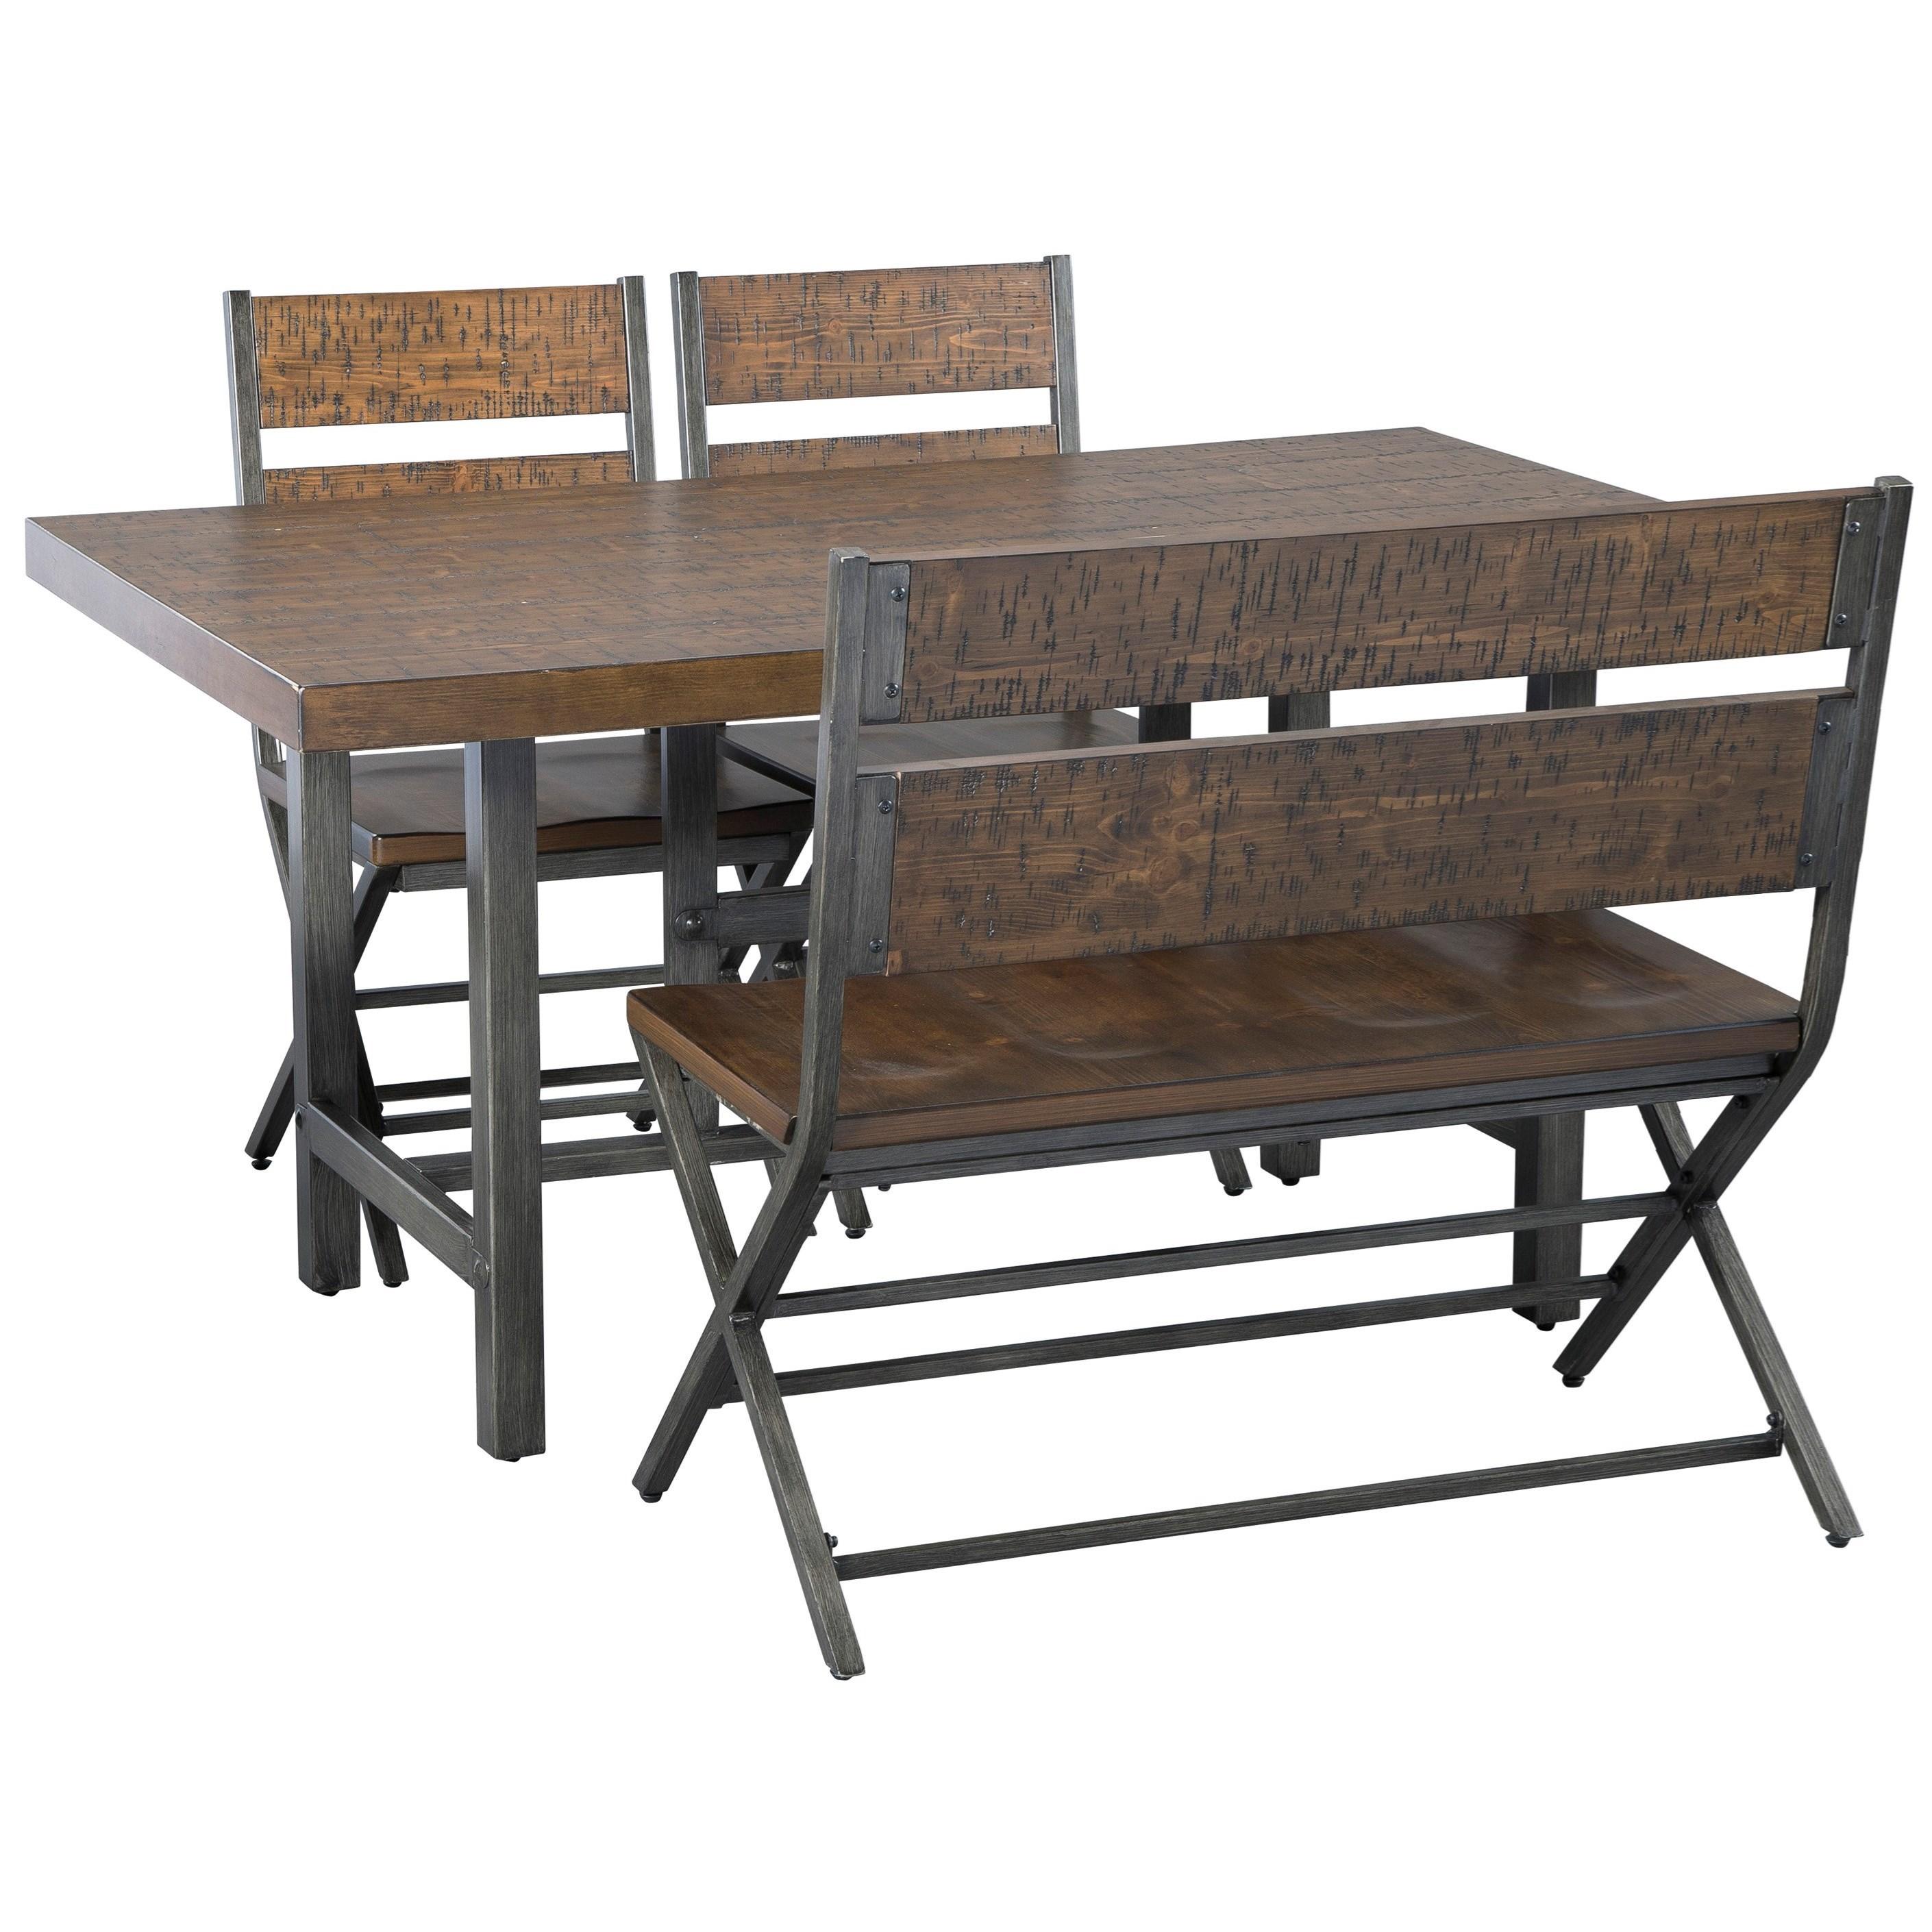 4-Piece Rectangular Table Set with Bench